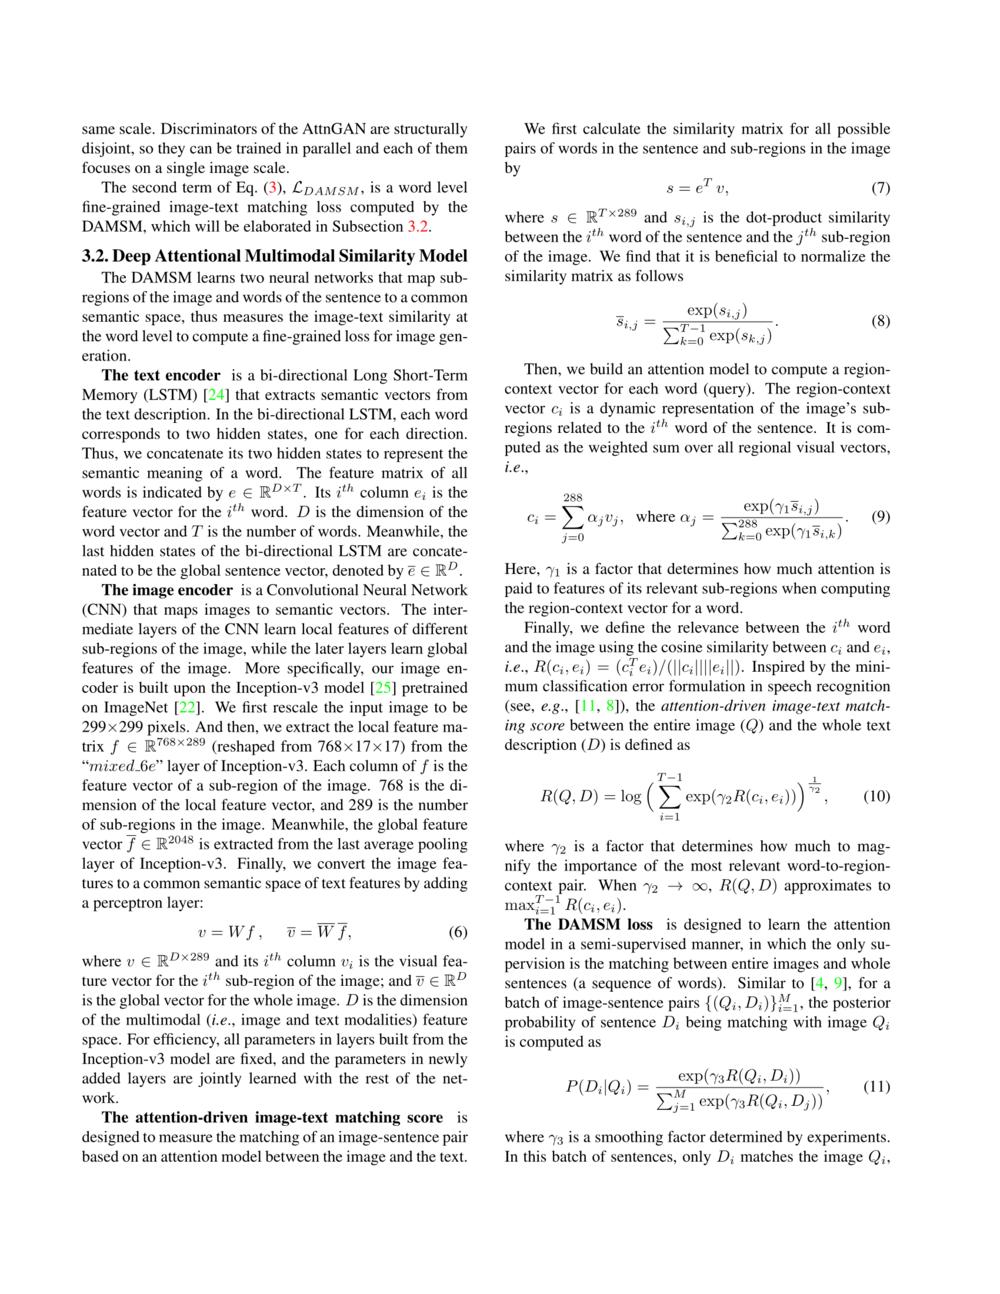 microsoft-researchers-build-a-bot-that-draws.001-4.png